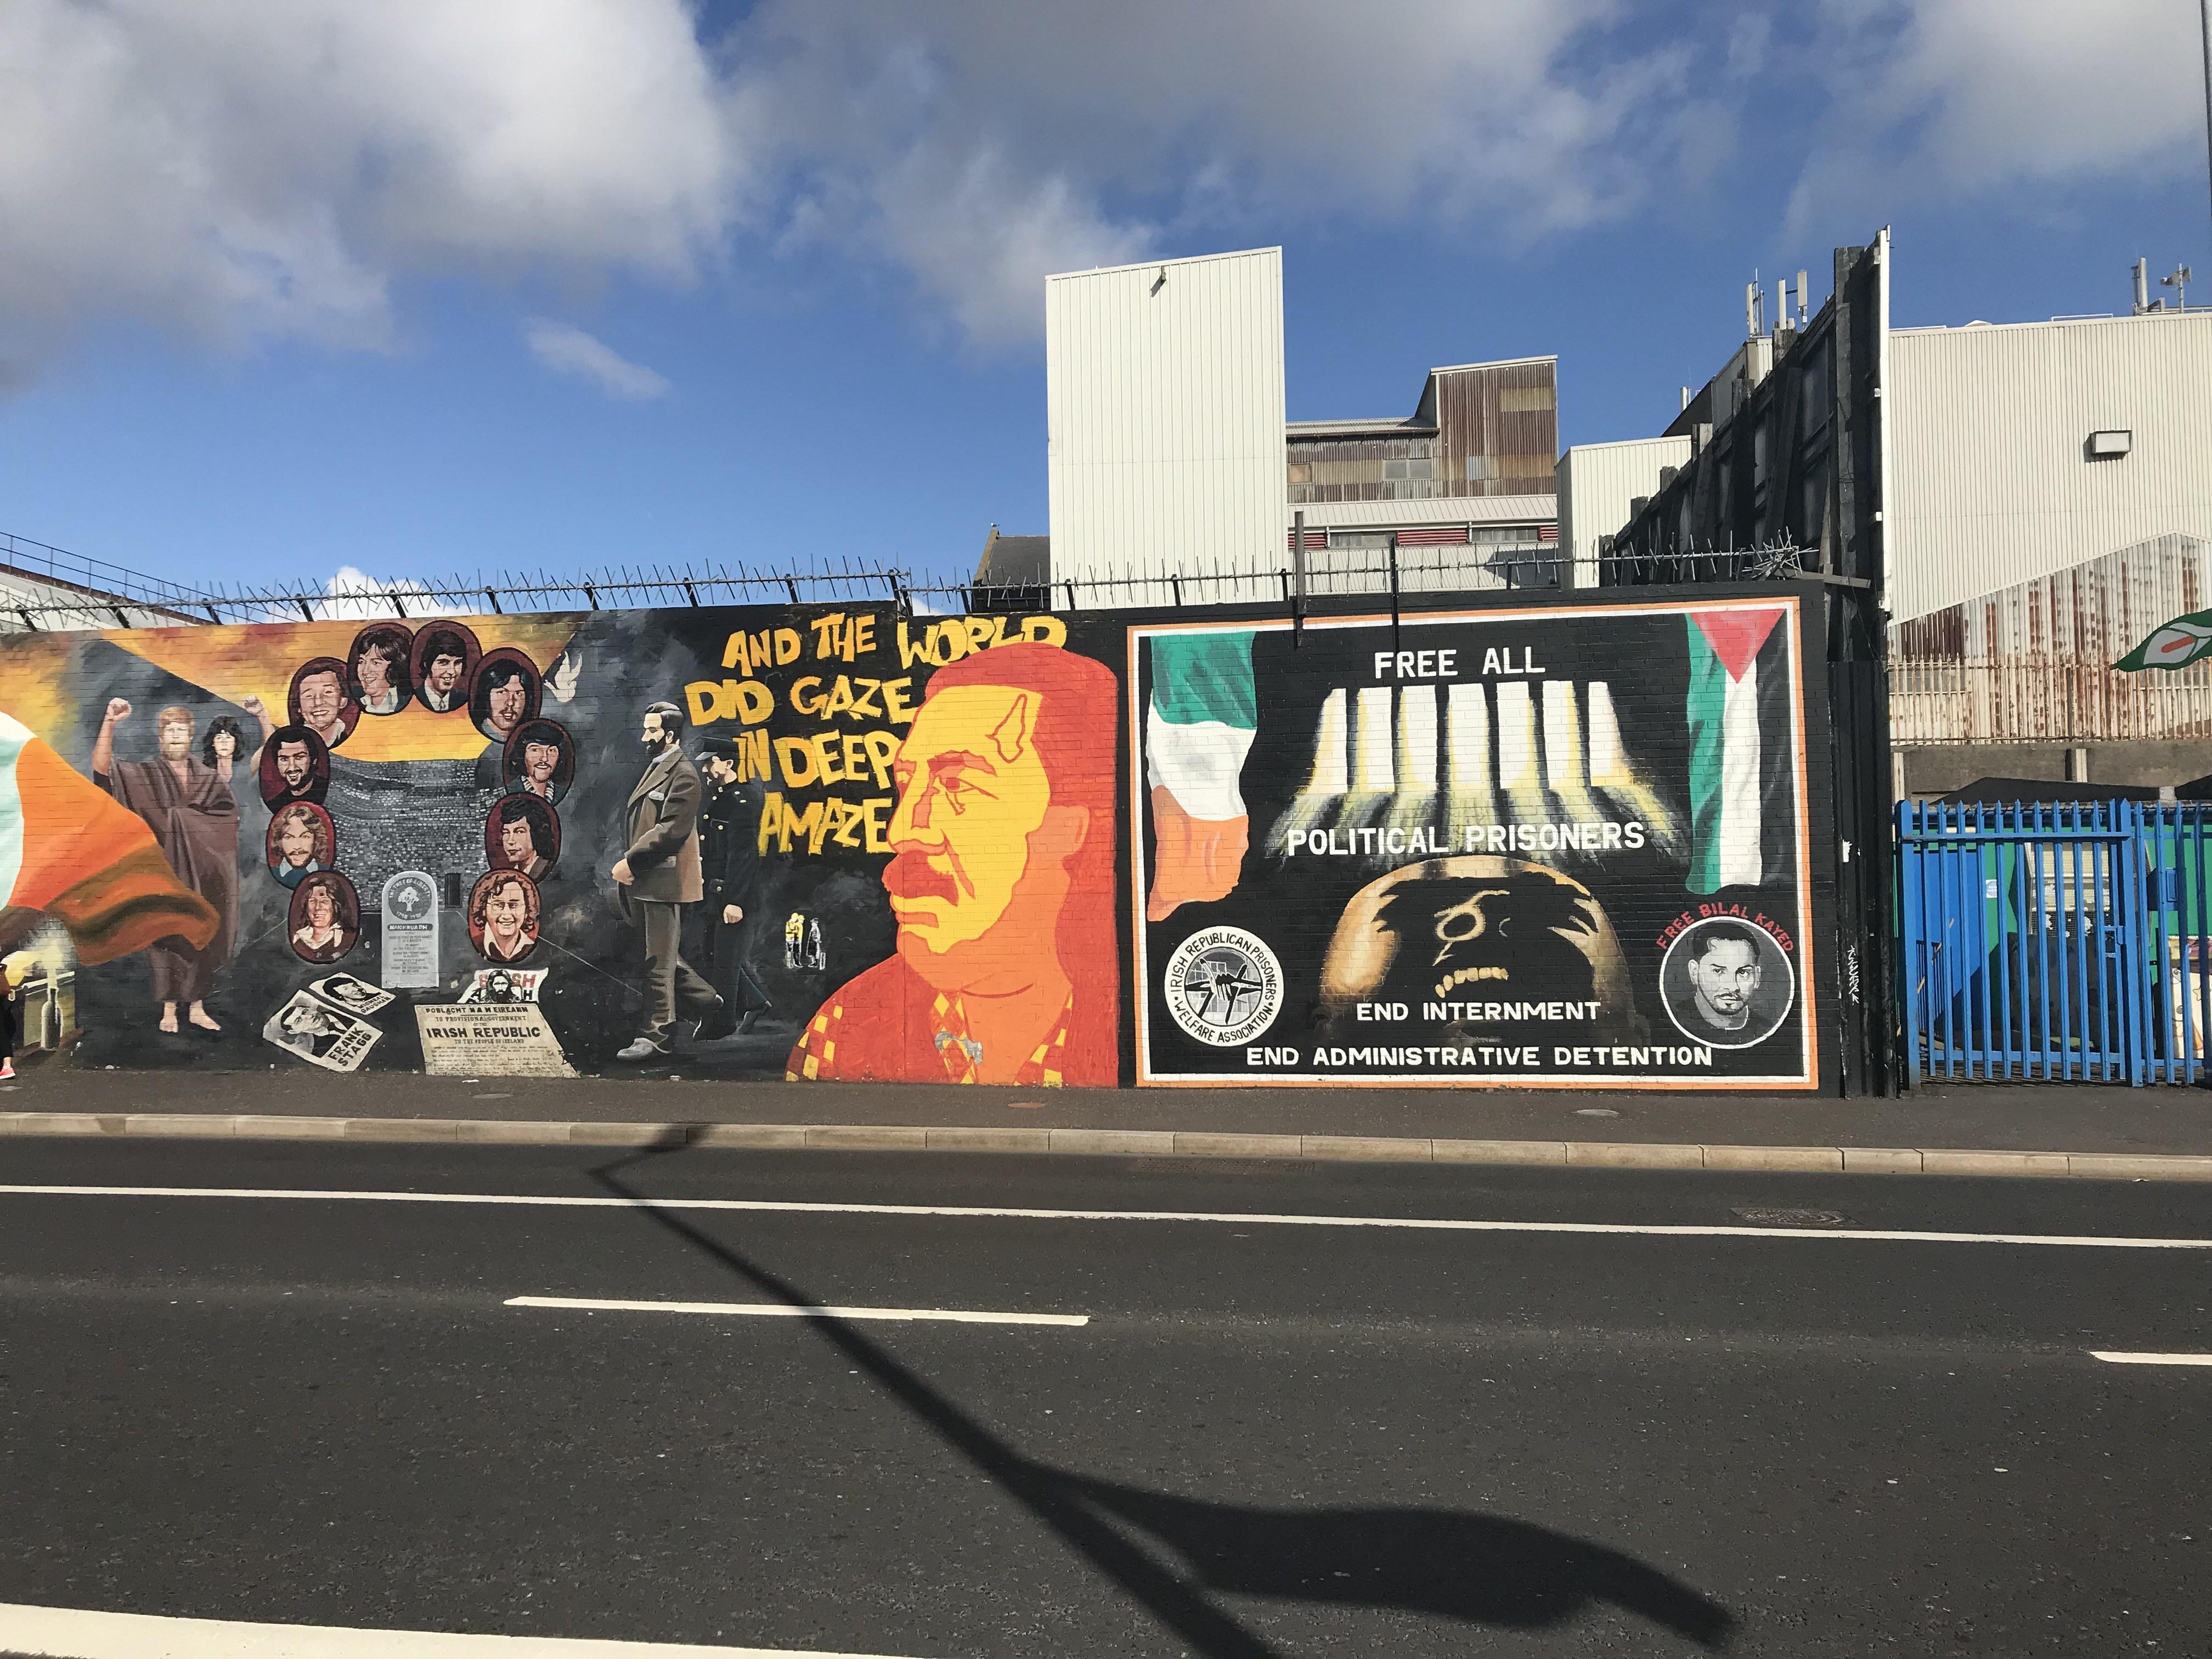 CAPAStudyAbroad_Dublin_Spring2018_From Brandon Mooney - Graffiti of a Wall Outside Catholic Neighborhood